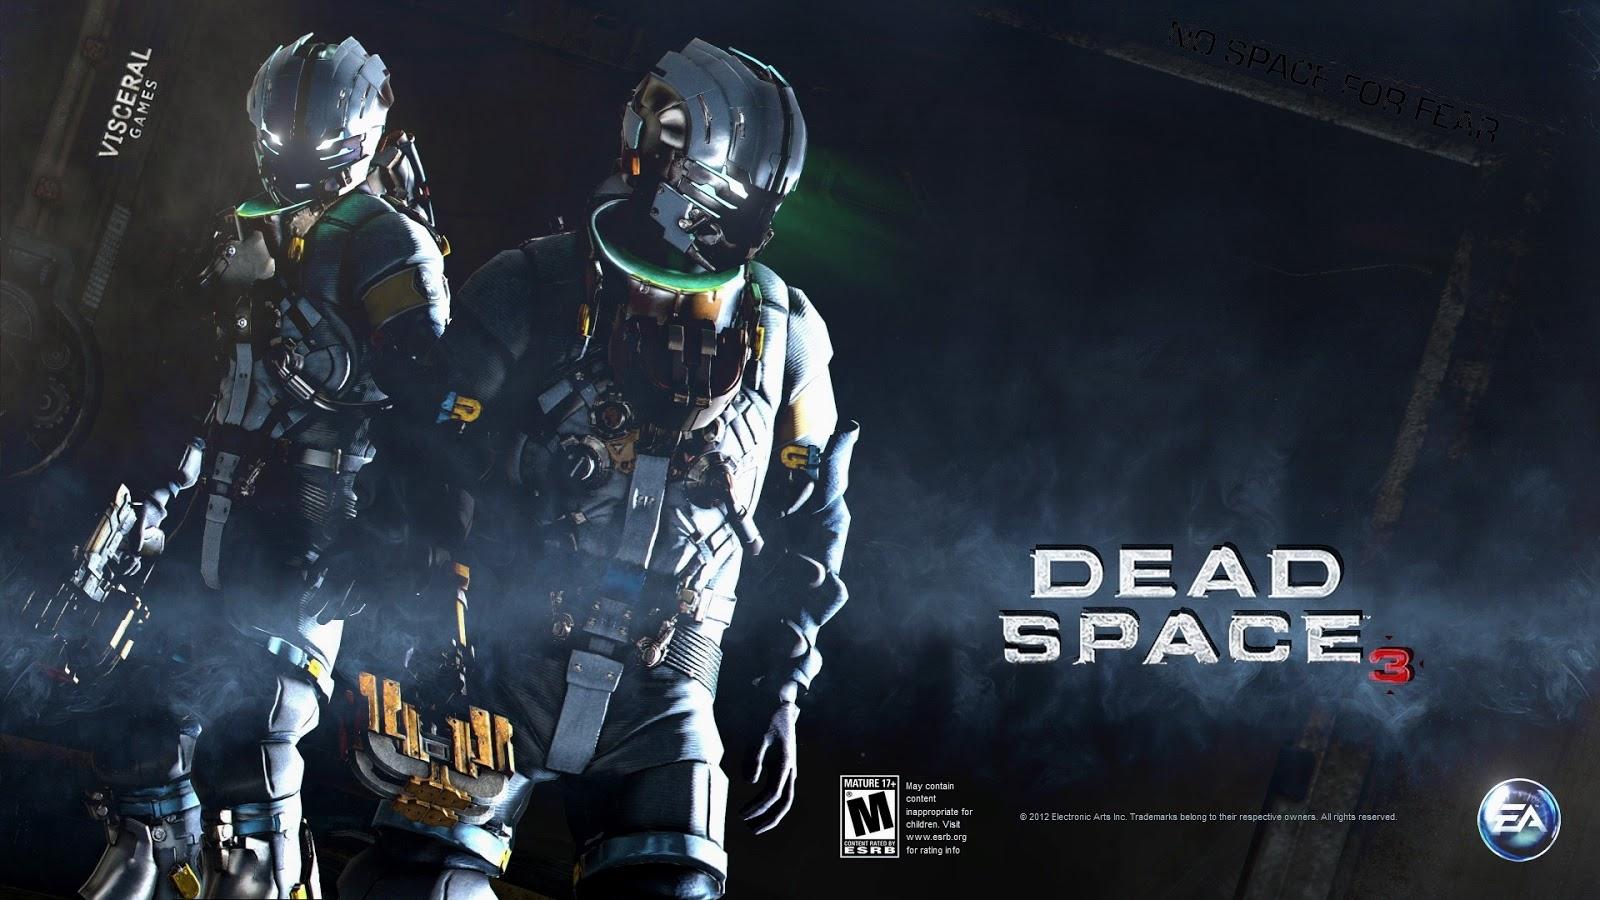 Dead space wallpaper for computer wallpapersafari - Dead space 2 wallpaper 1080p ...